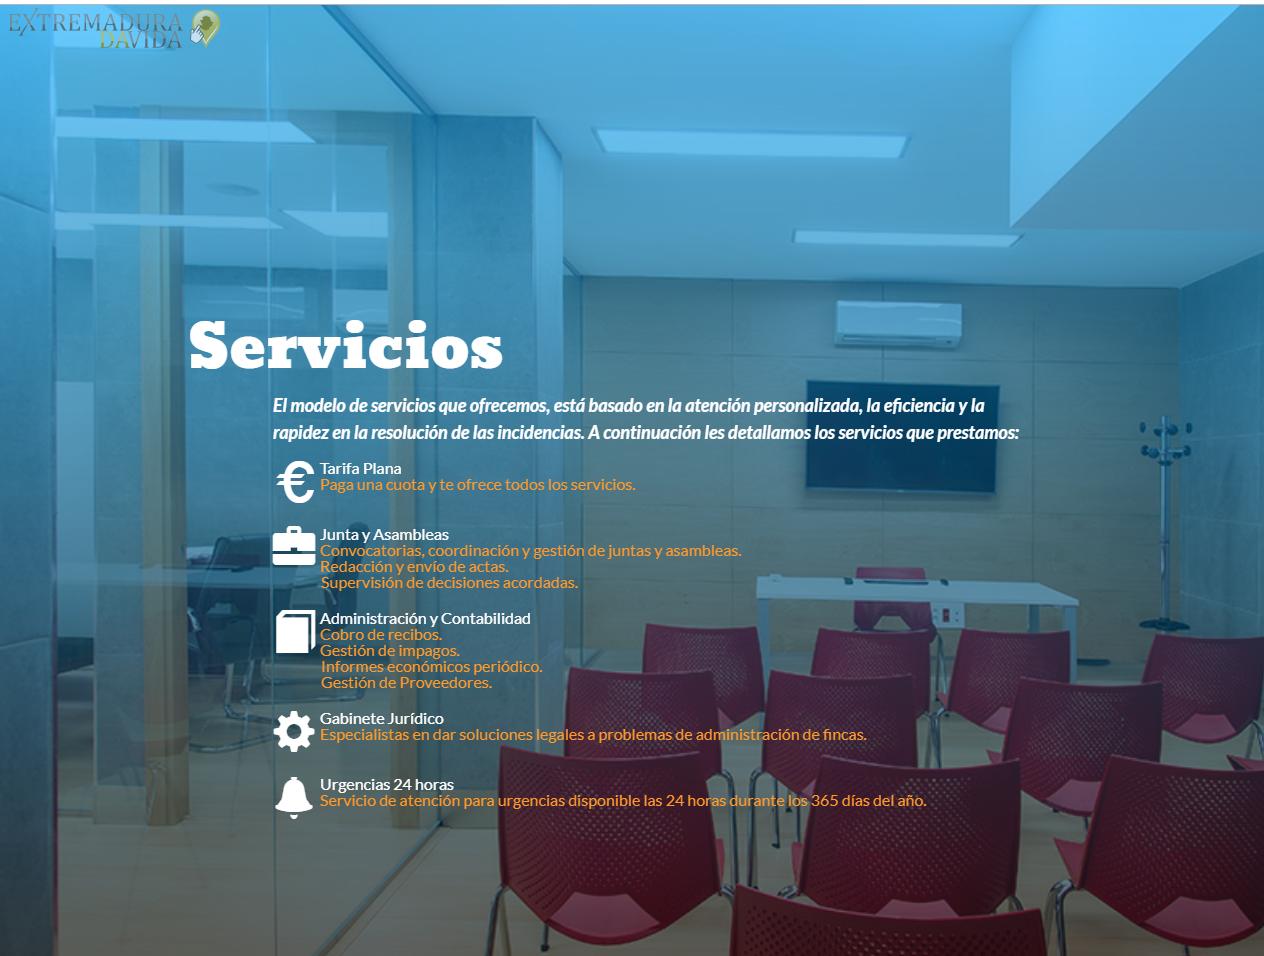 Mantenimientos Comunidades Cáceres Luis Regaña Administración fincas